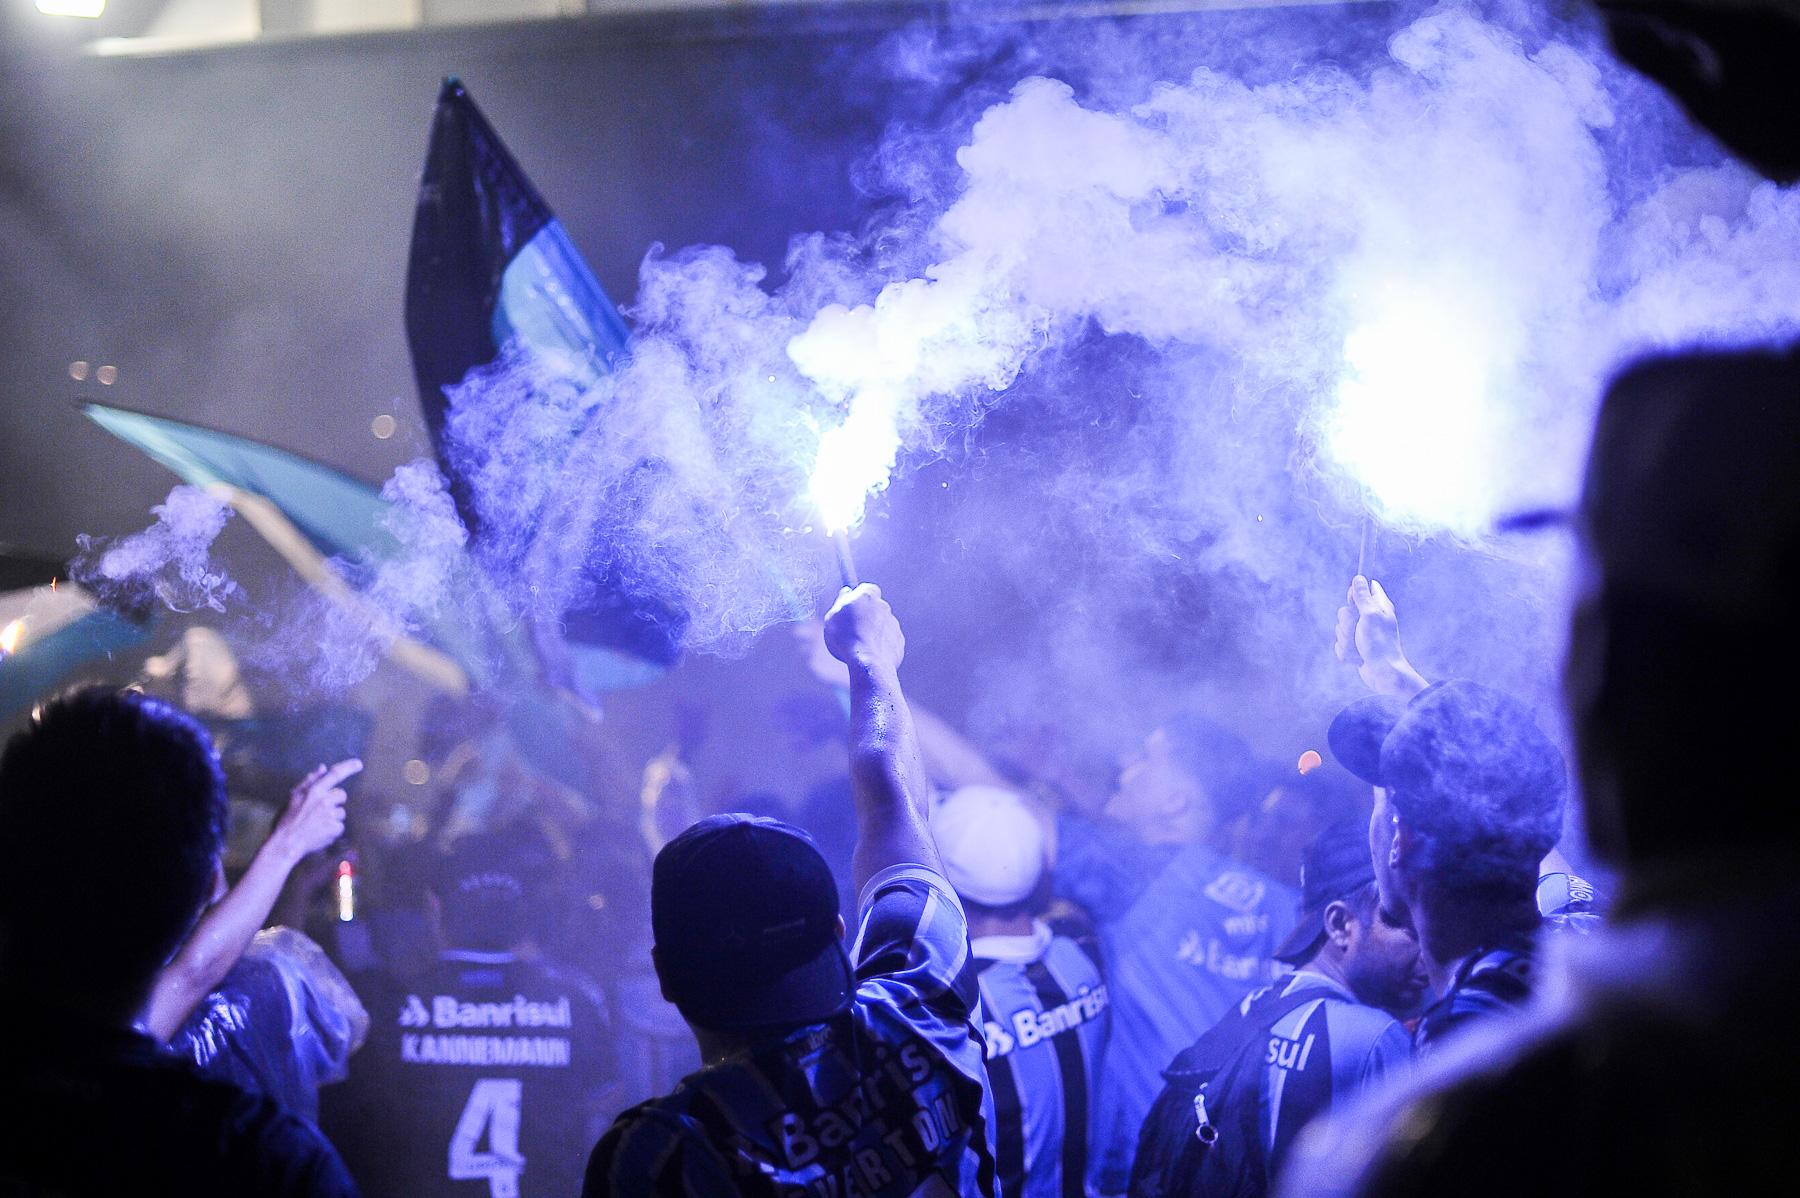 Gremio_X_Flamengo_dudabairros_Eleven_009